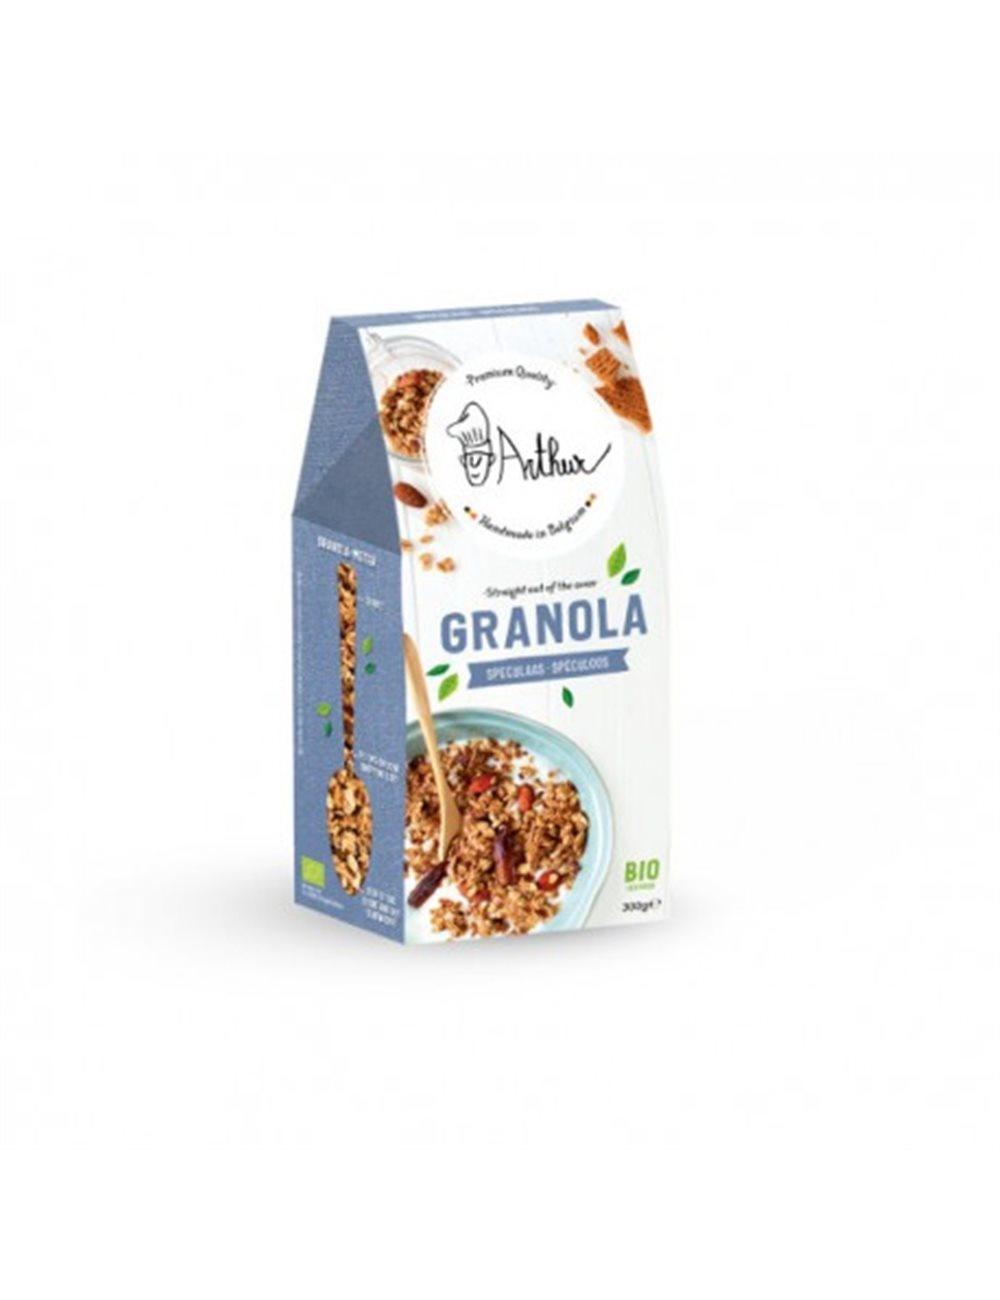 Arthur's Mix Granola Speculaas BIO